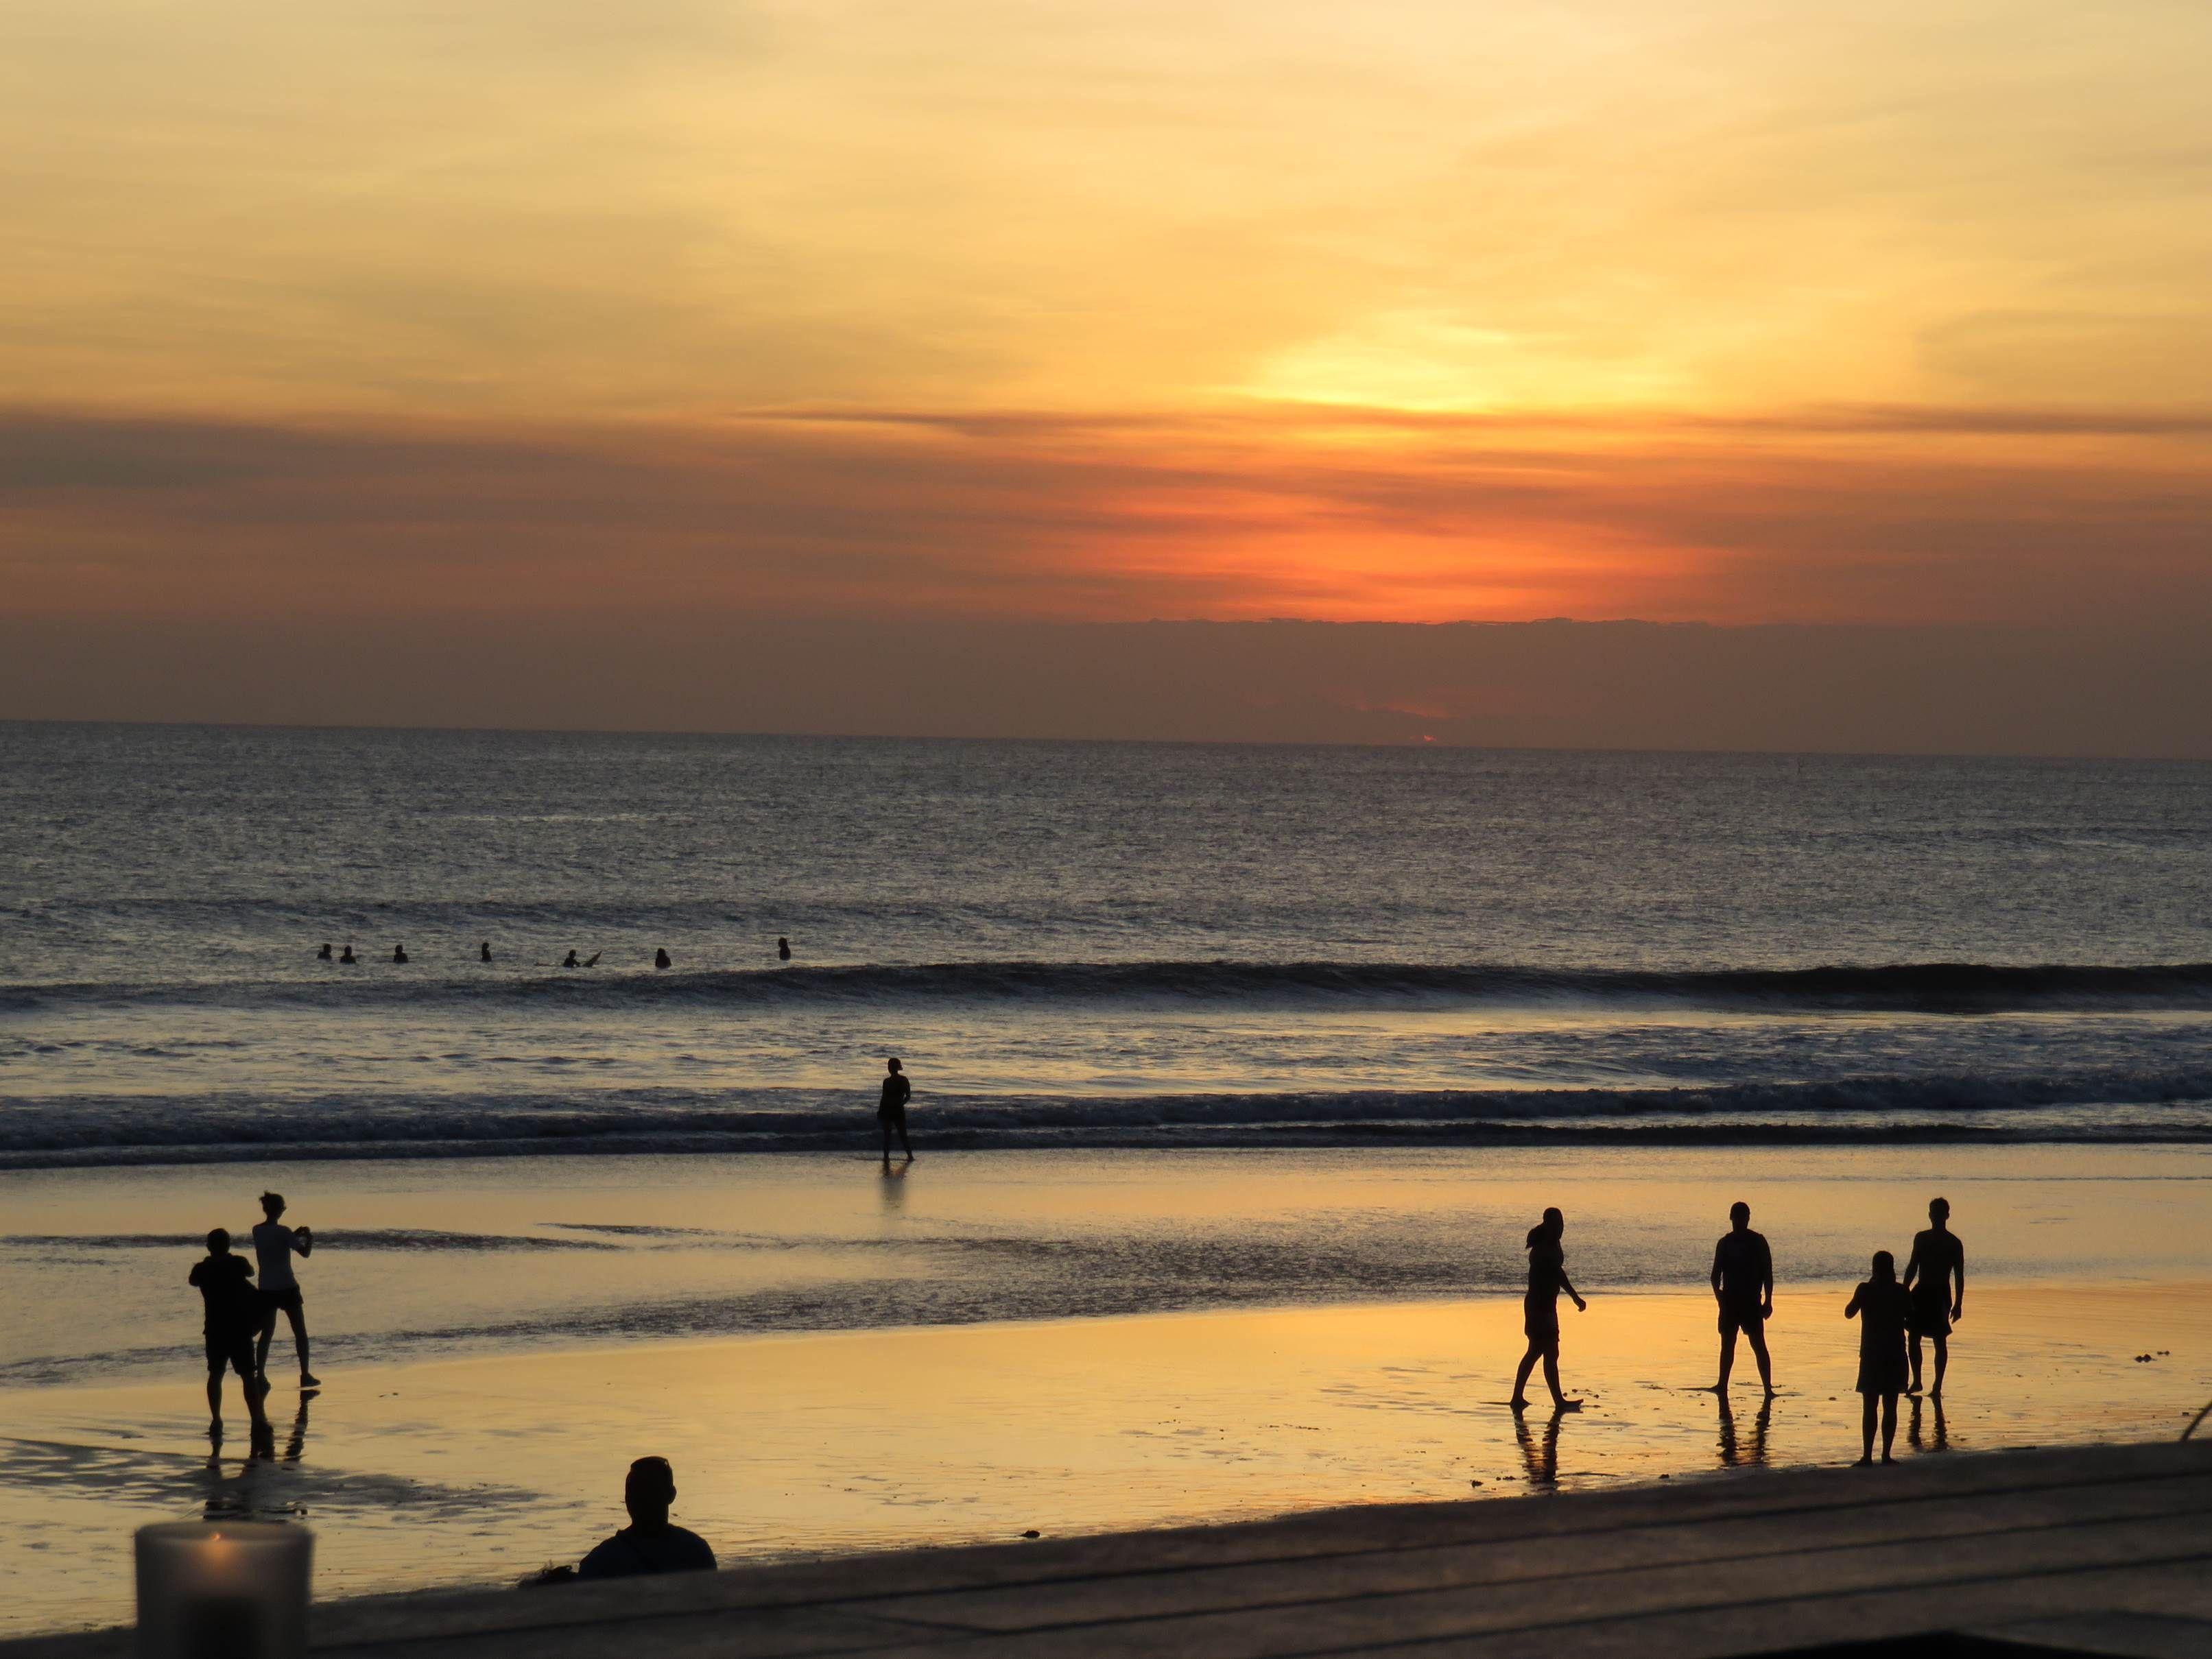 Viagem para Bali: Uluwatu, Padang Padang e mais do sul da ilha.